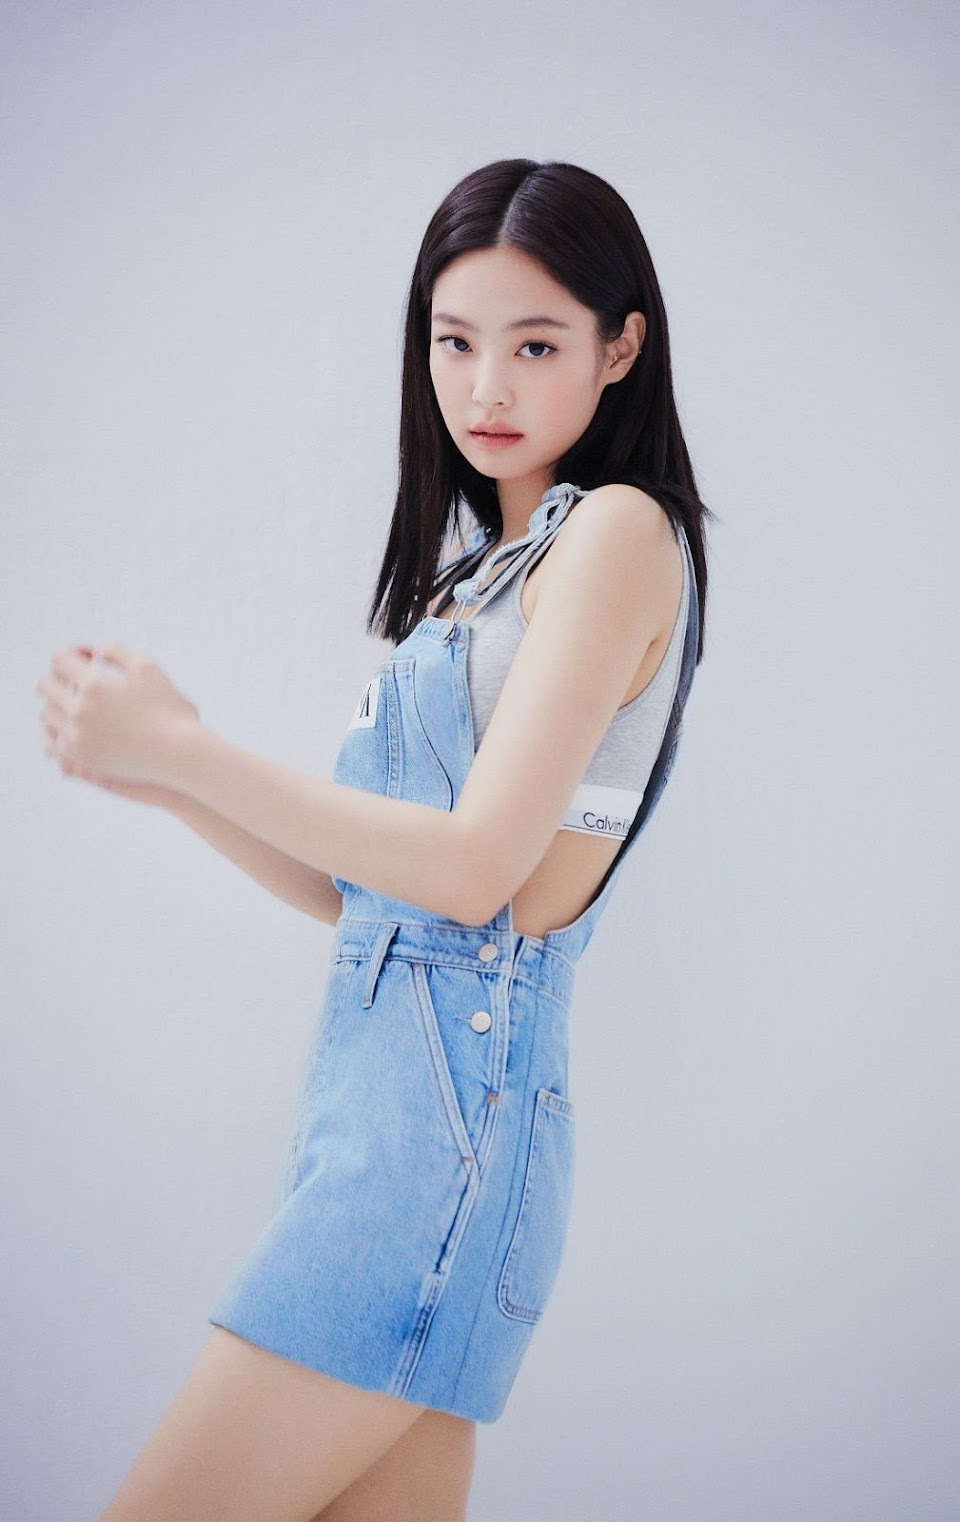 jennie overall dress